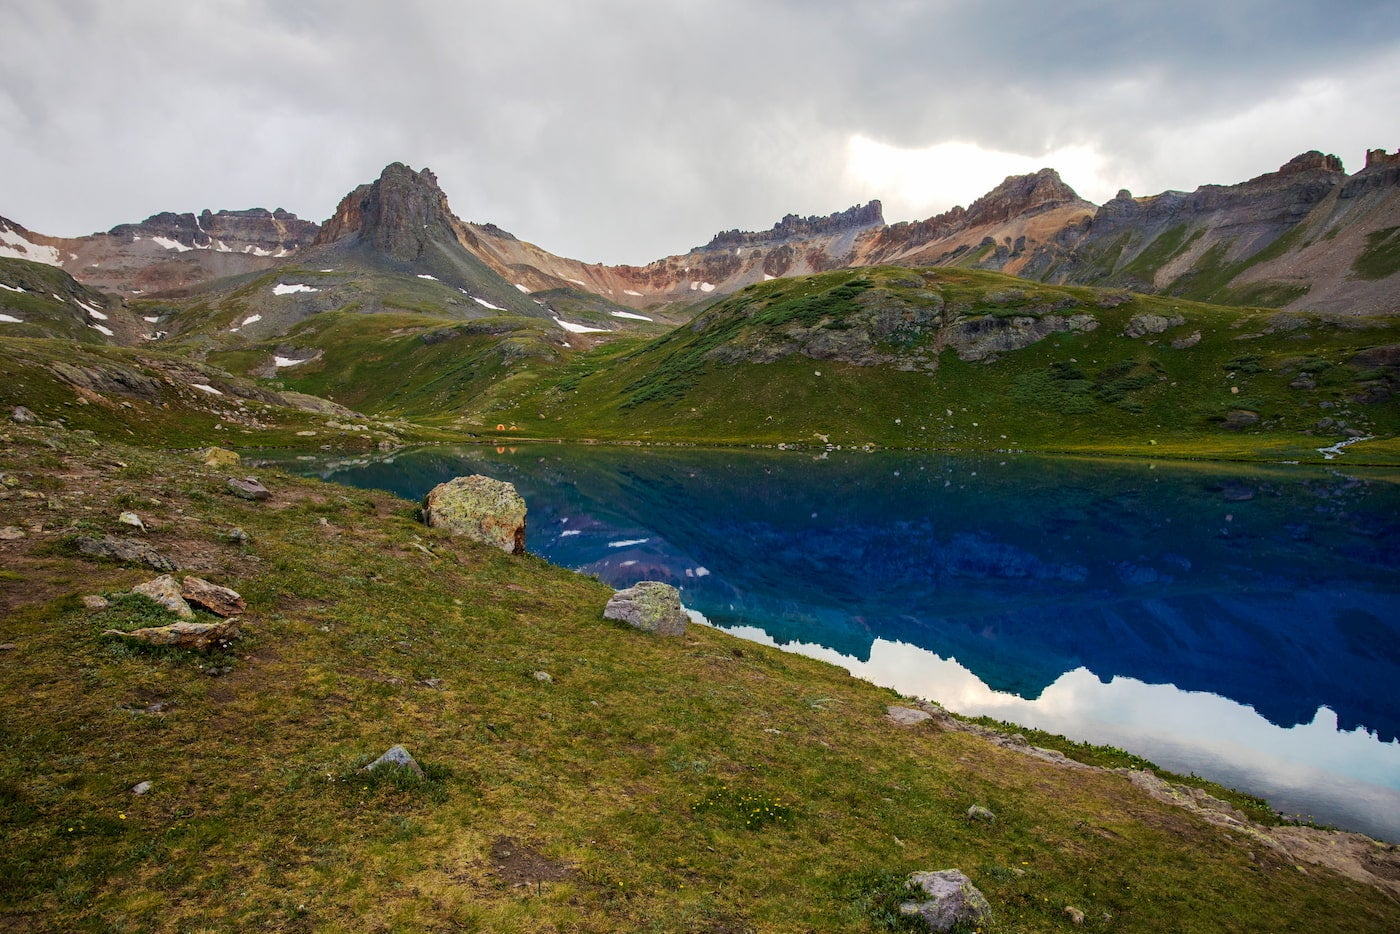 Reflection of San Juan Mountains in alpine ice lakes.